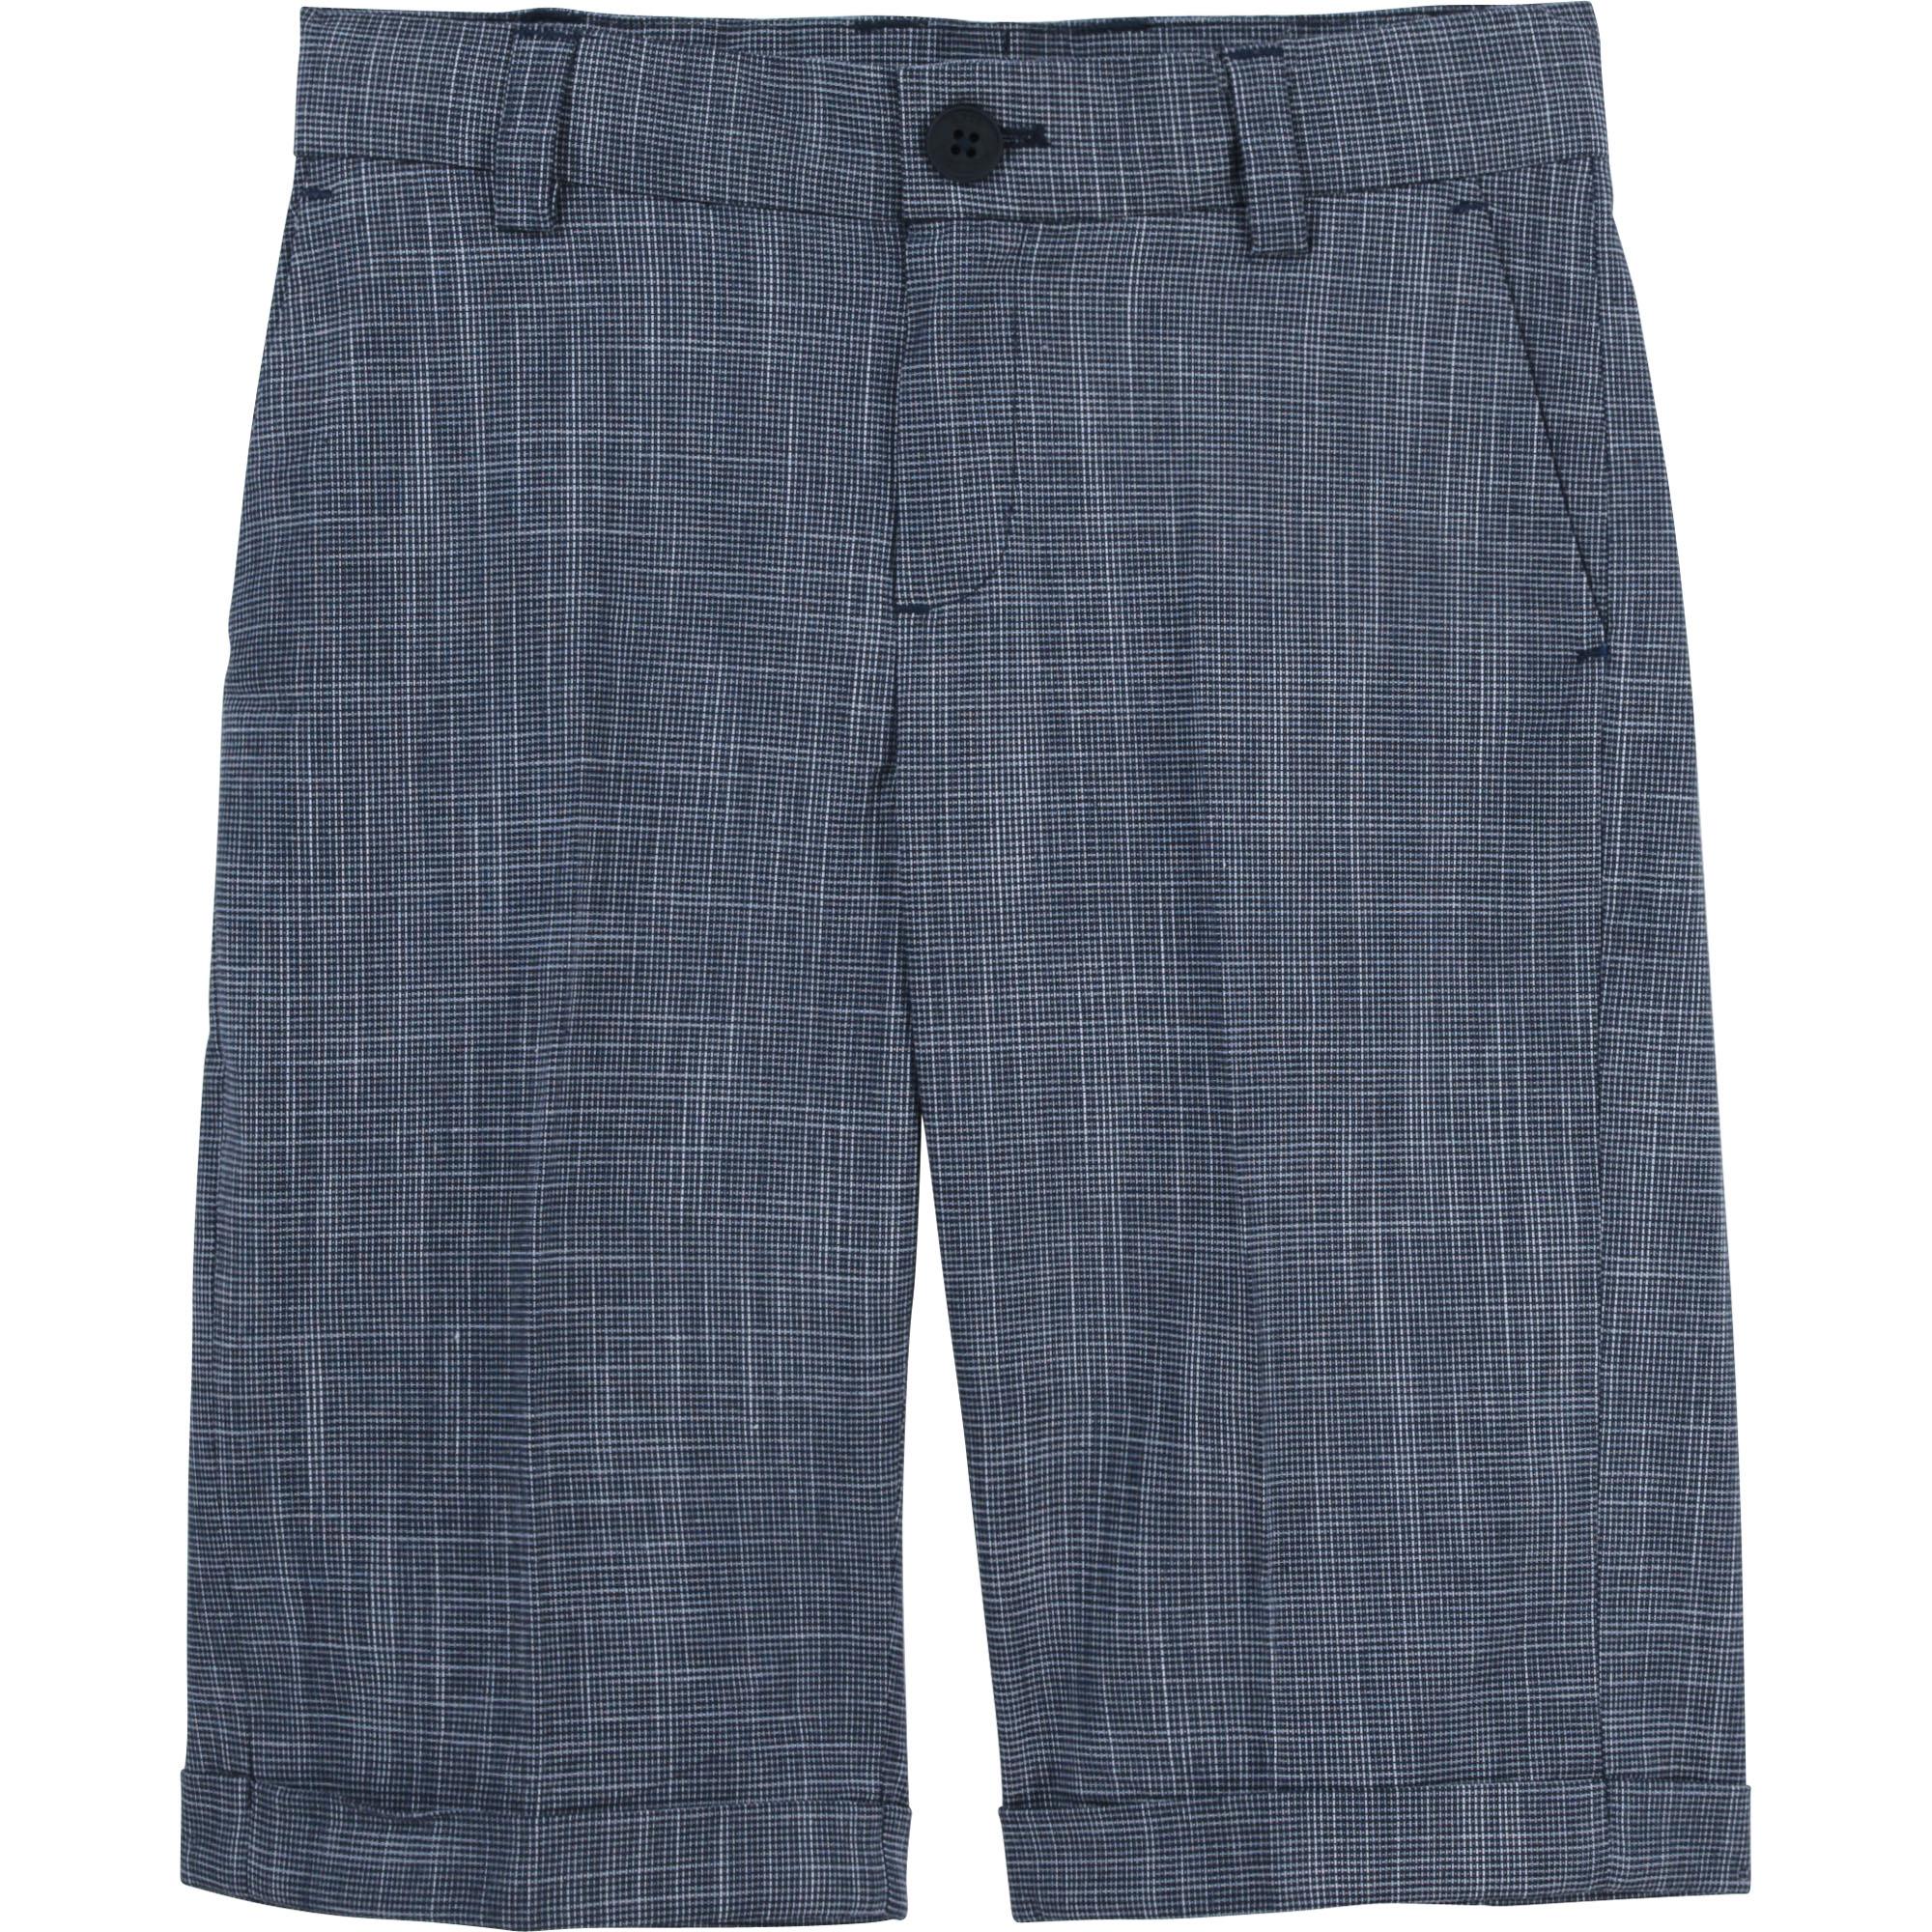 Cotton dress bermuda shorts BOSS for BOY